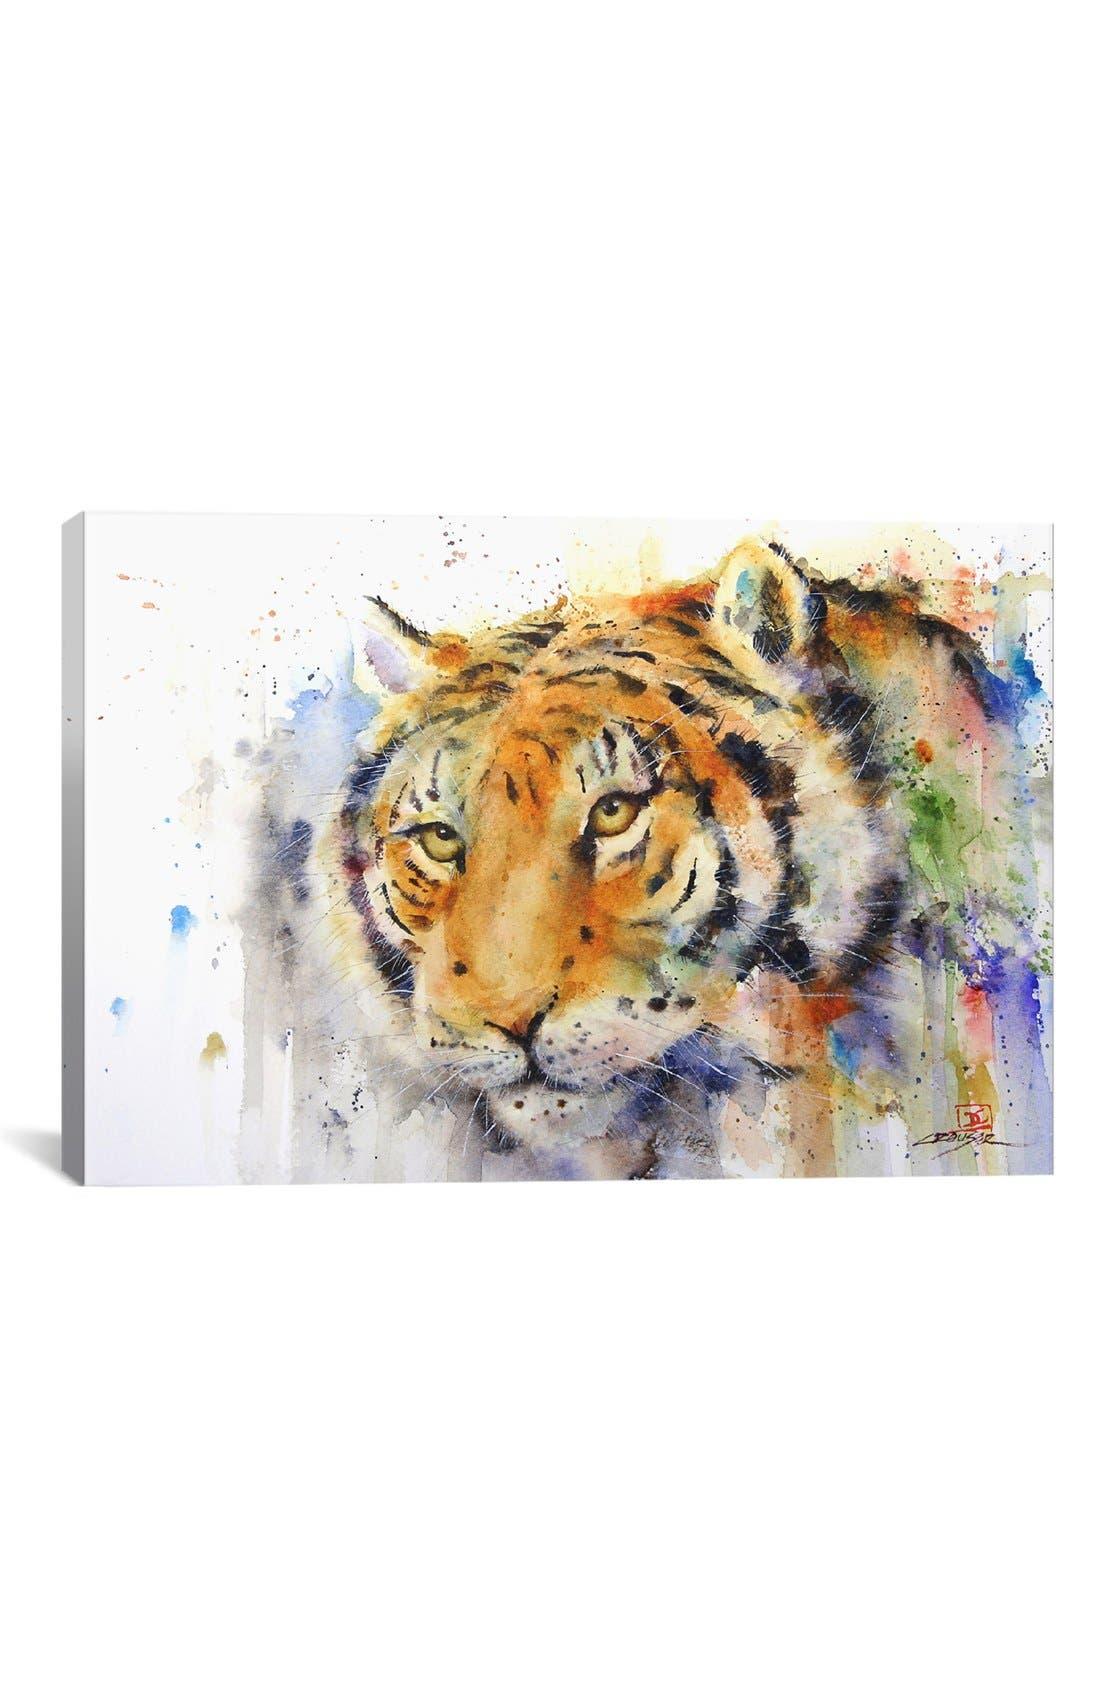 Main Image - iCanvas 'Tiger - Dean Crouser' Giclée Print Canvas Art